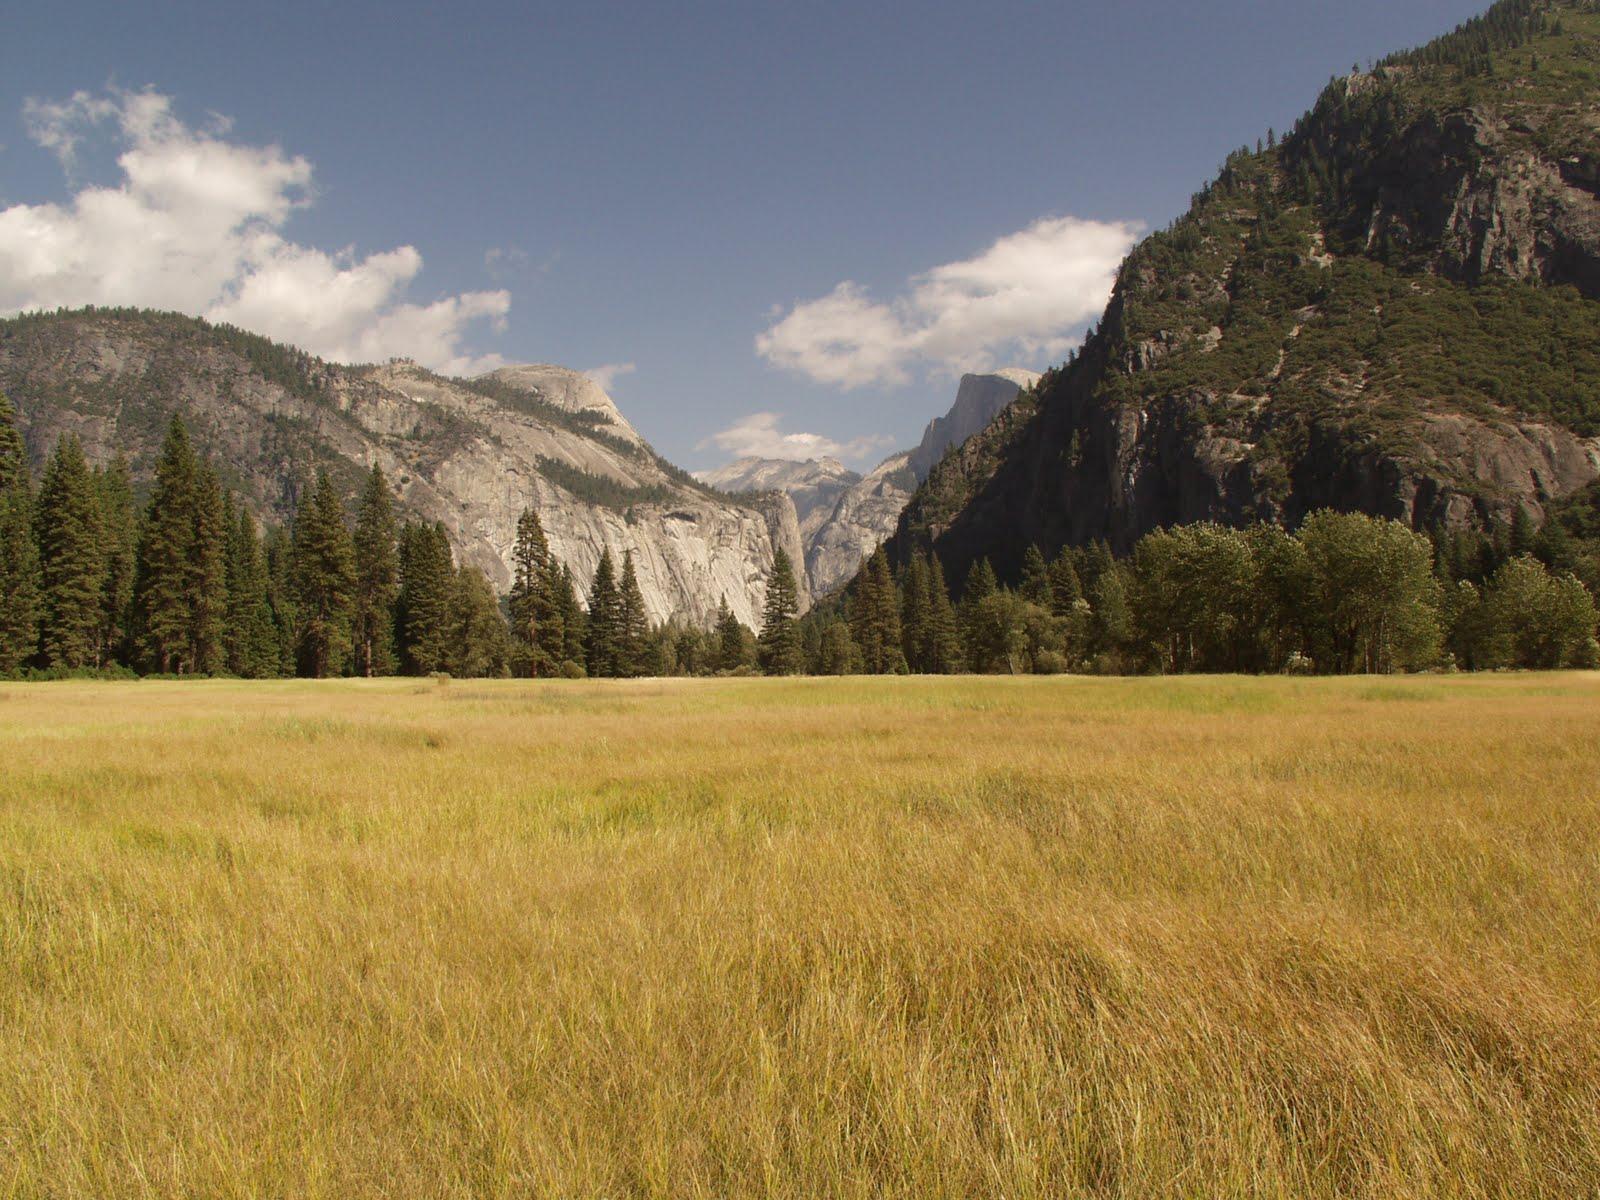 http://4.bp.blogspot.com/-LNUufyDOTVg/TgsqQ_jnhPI/AAAAAAAAAEM/UEkq-8cLF38/s1600/Yosemite%2BValley.jpg